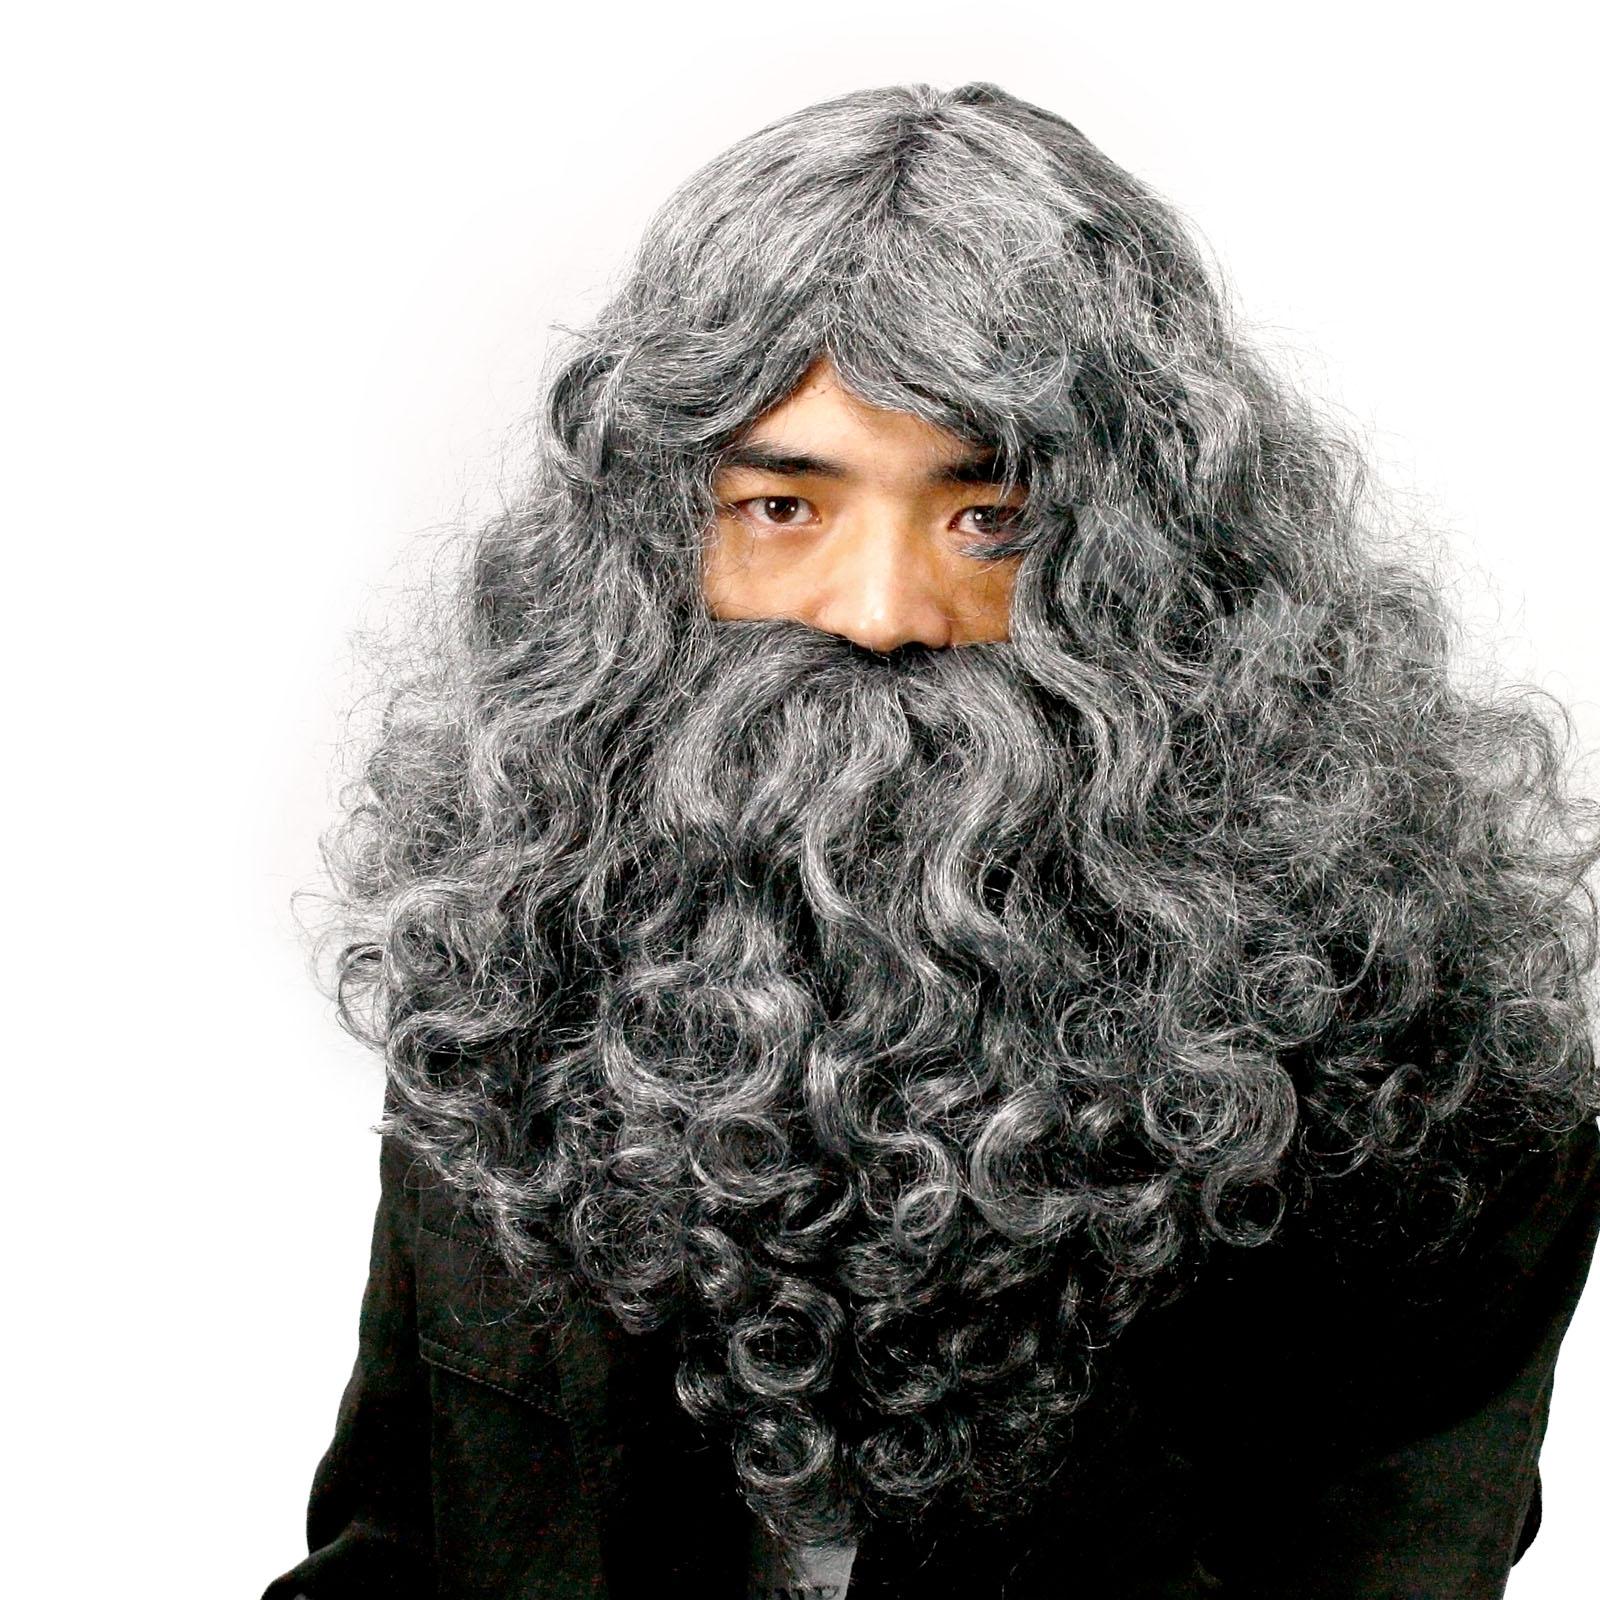 Old Men Father Christmas Cosplay Dark Grey Hairpiece ... Old Man Fake Beard